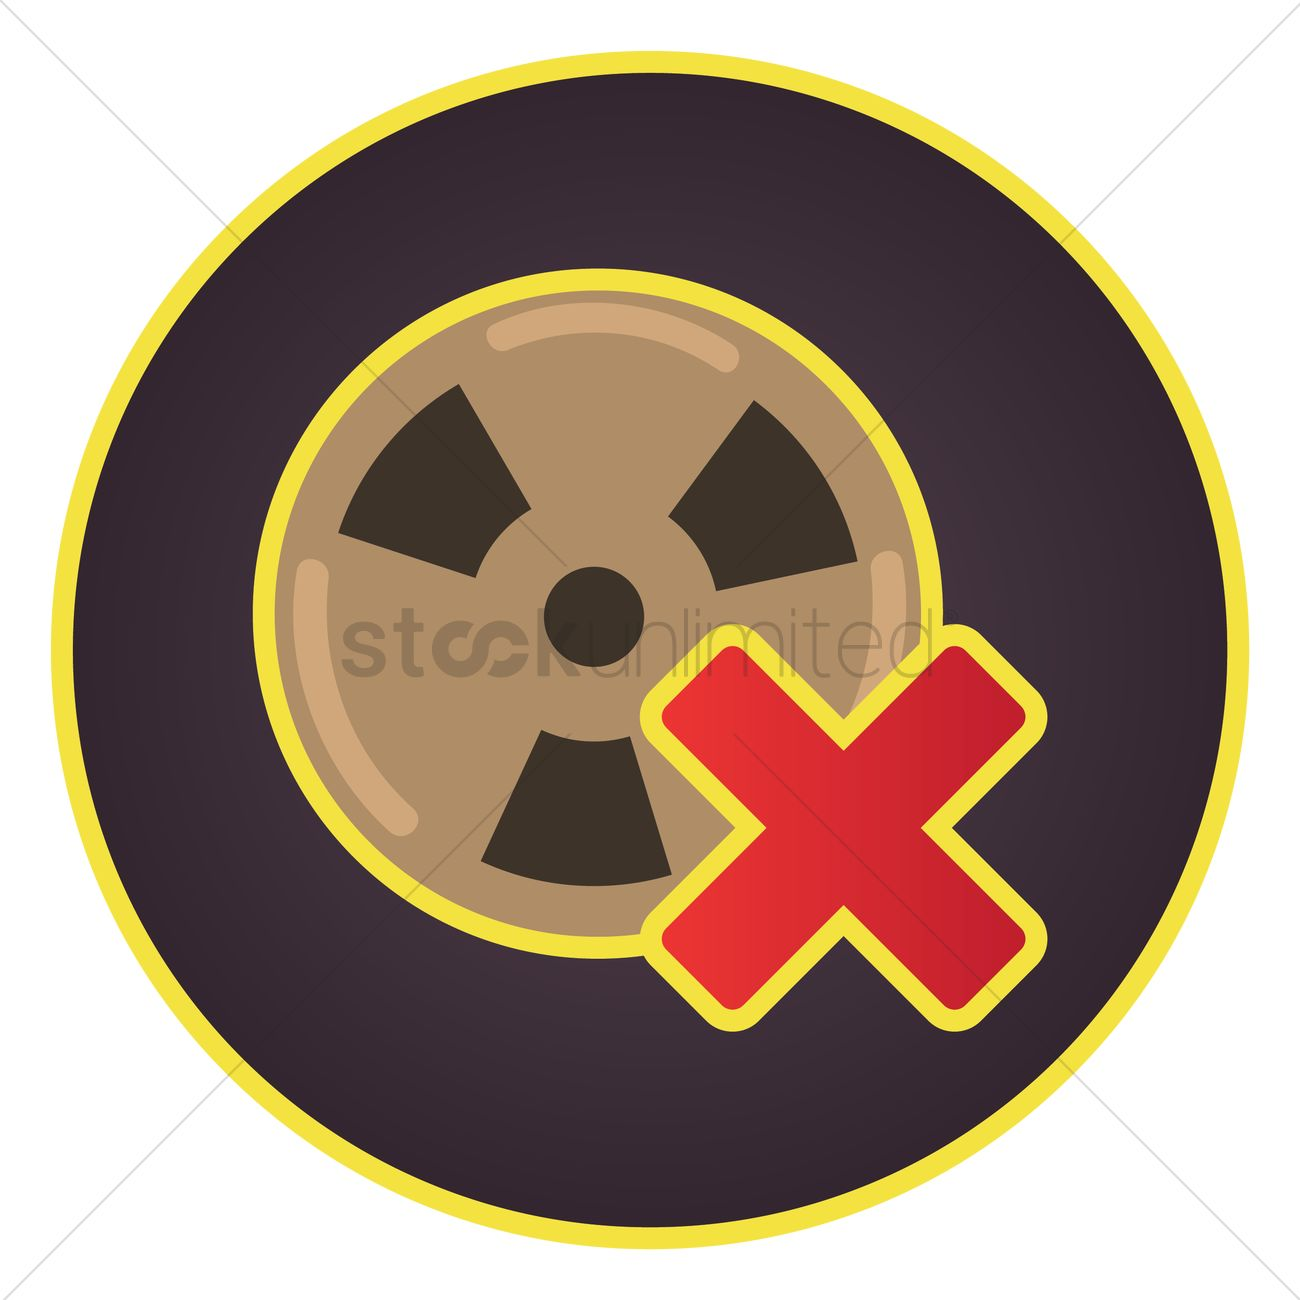 Radioactive symbol vector image 2017312 stockunlimited radioactive symbol vector graphic buycottarizona